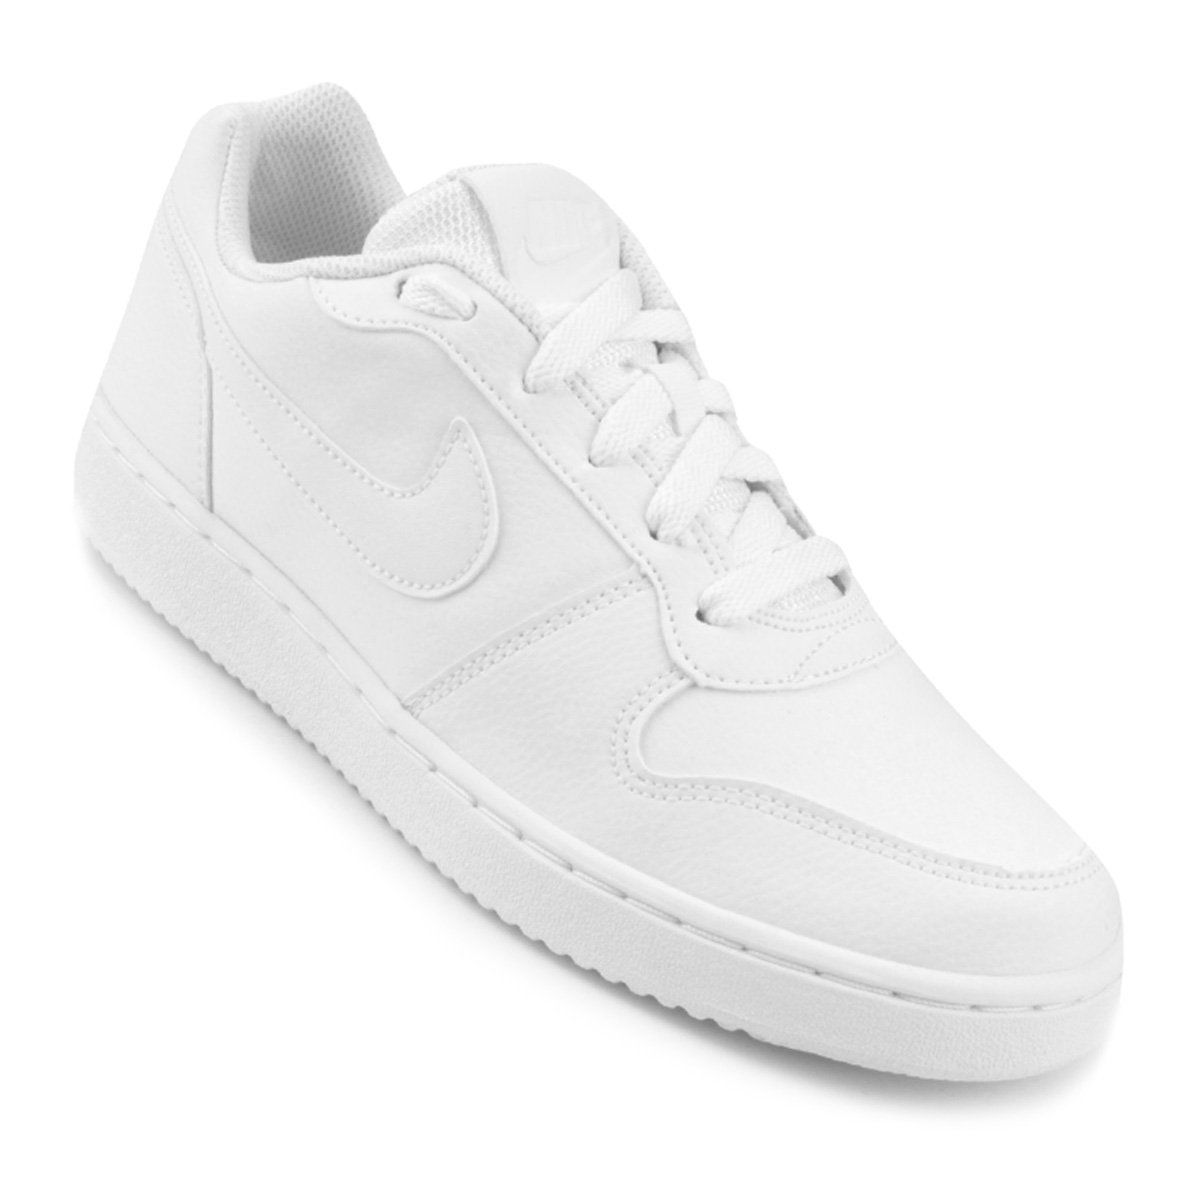 Tênis Nike Ebernon Low Feminino - Branco - Compre Agora  409f2046859a1